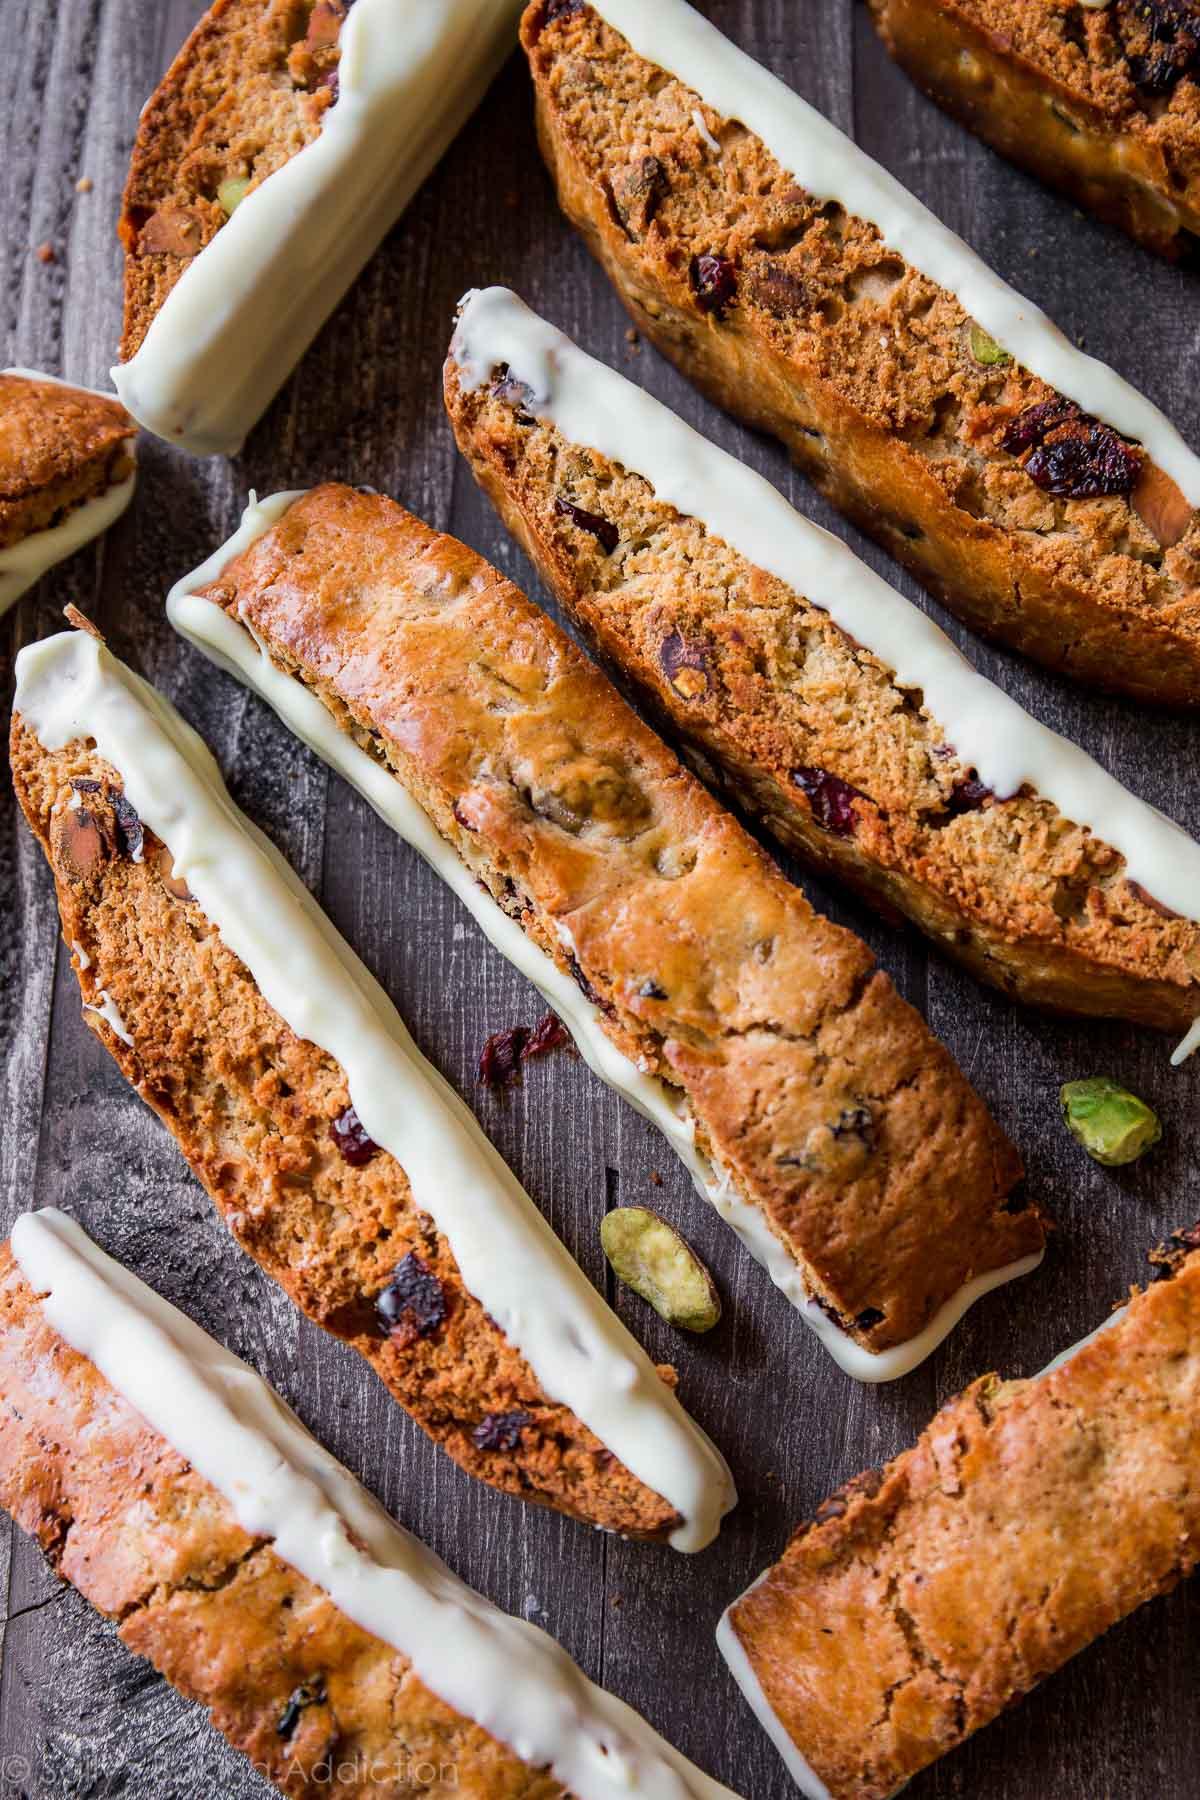 White Chocolate Cranberry Pistachio Biscotti - Sallys Baking Addiction